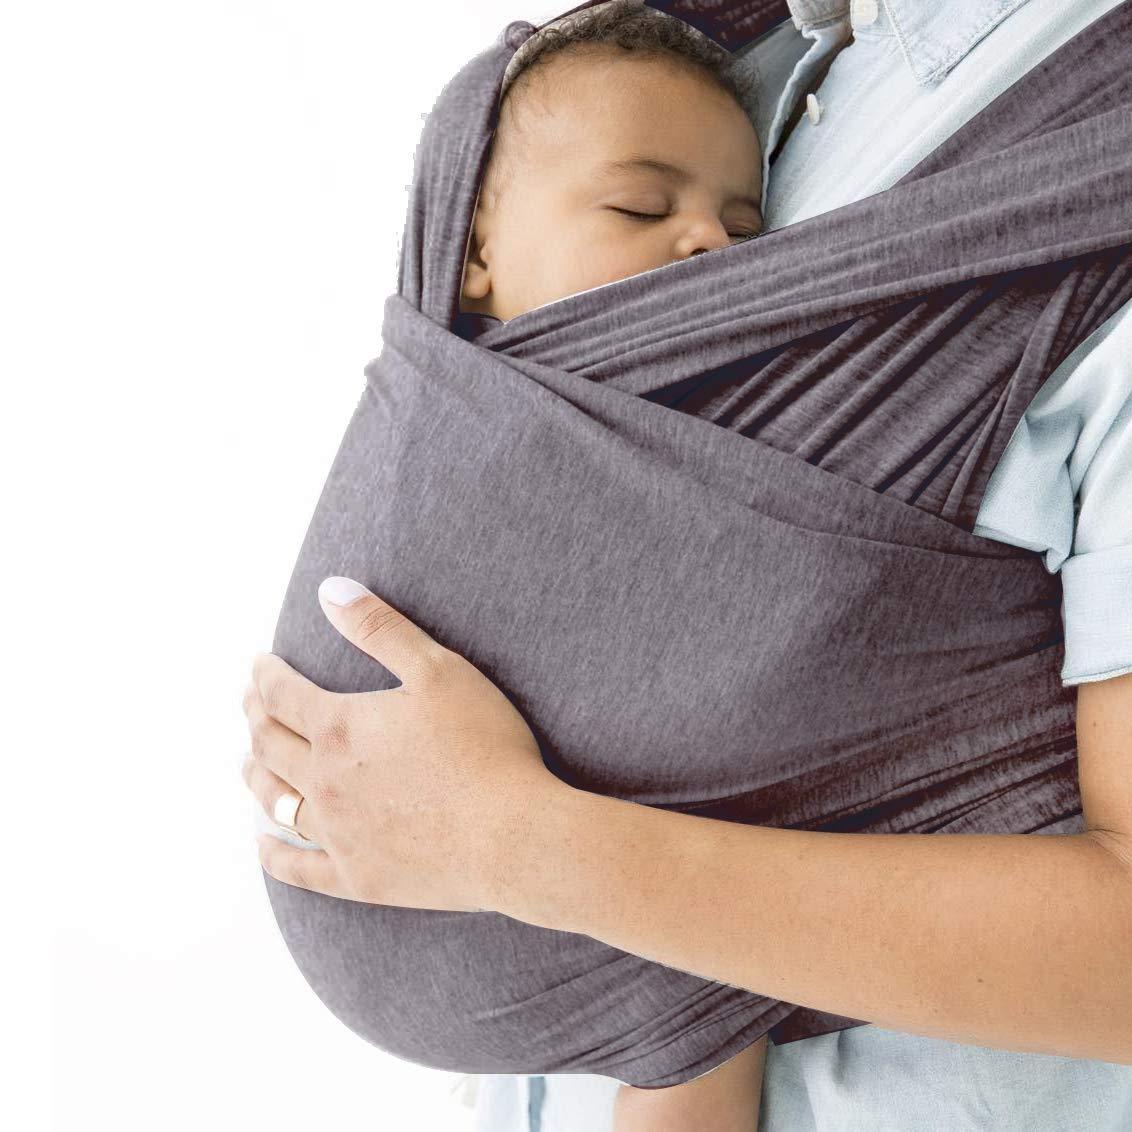 Amazon.com: Bebé Wrap Carrier hasta 35lbs, algodón, bandas ...